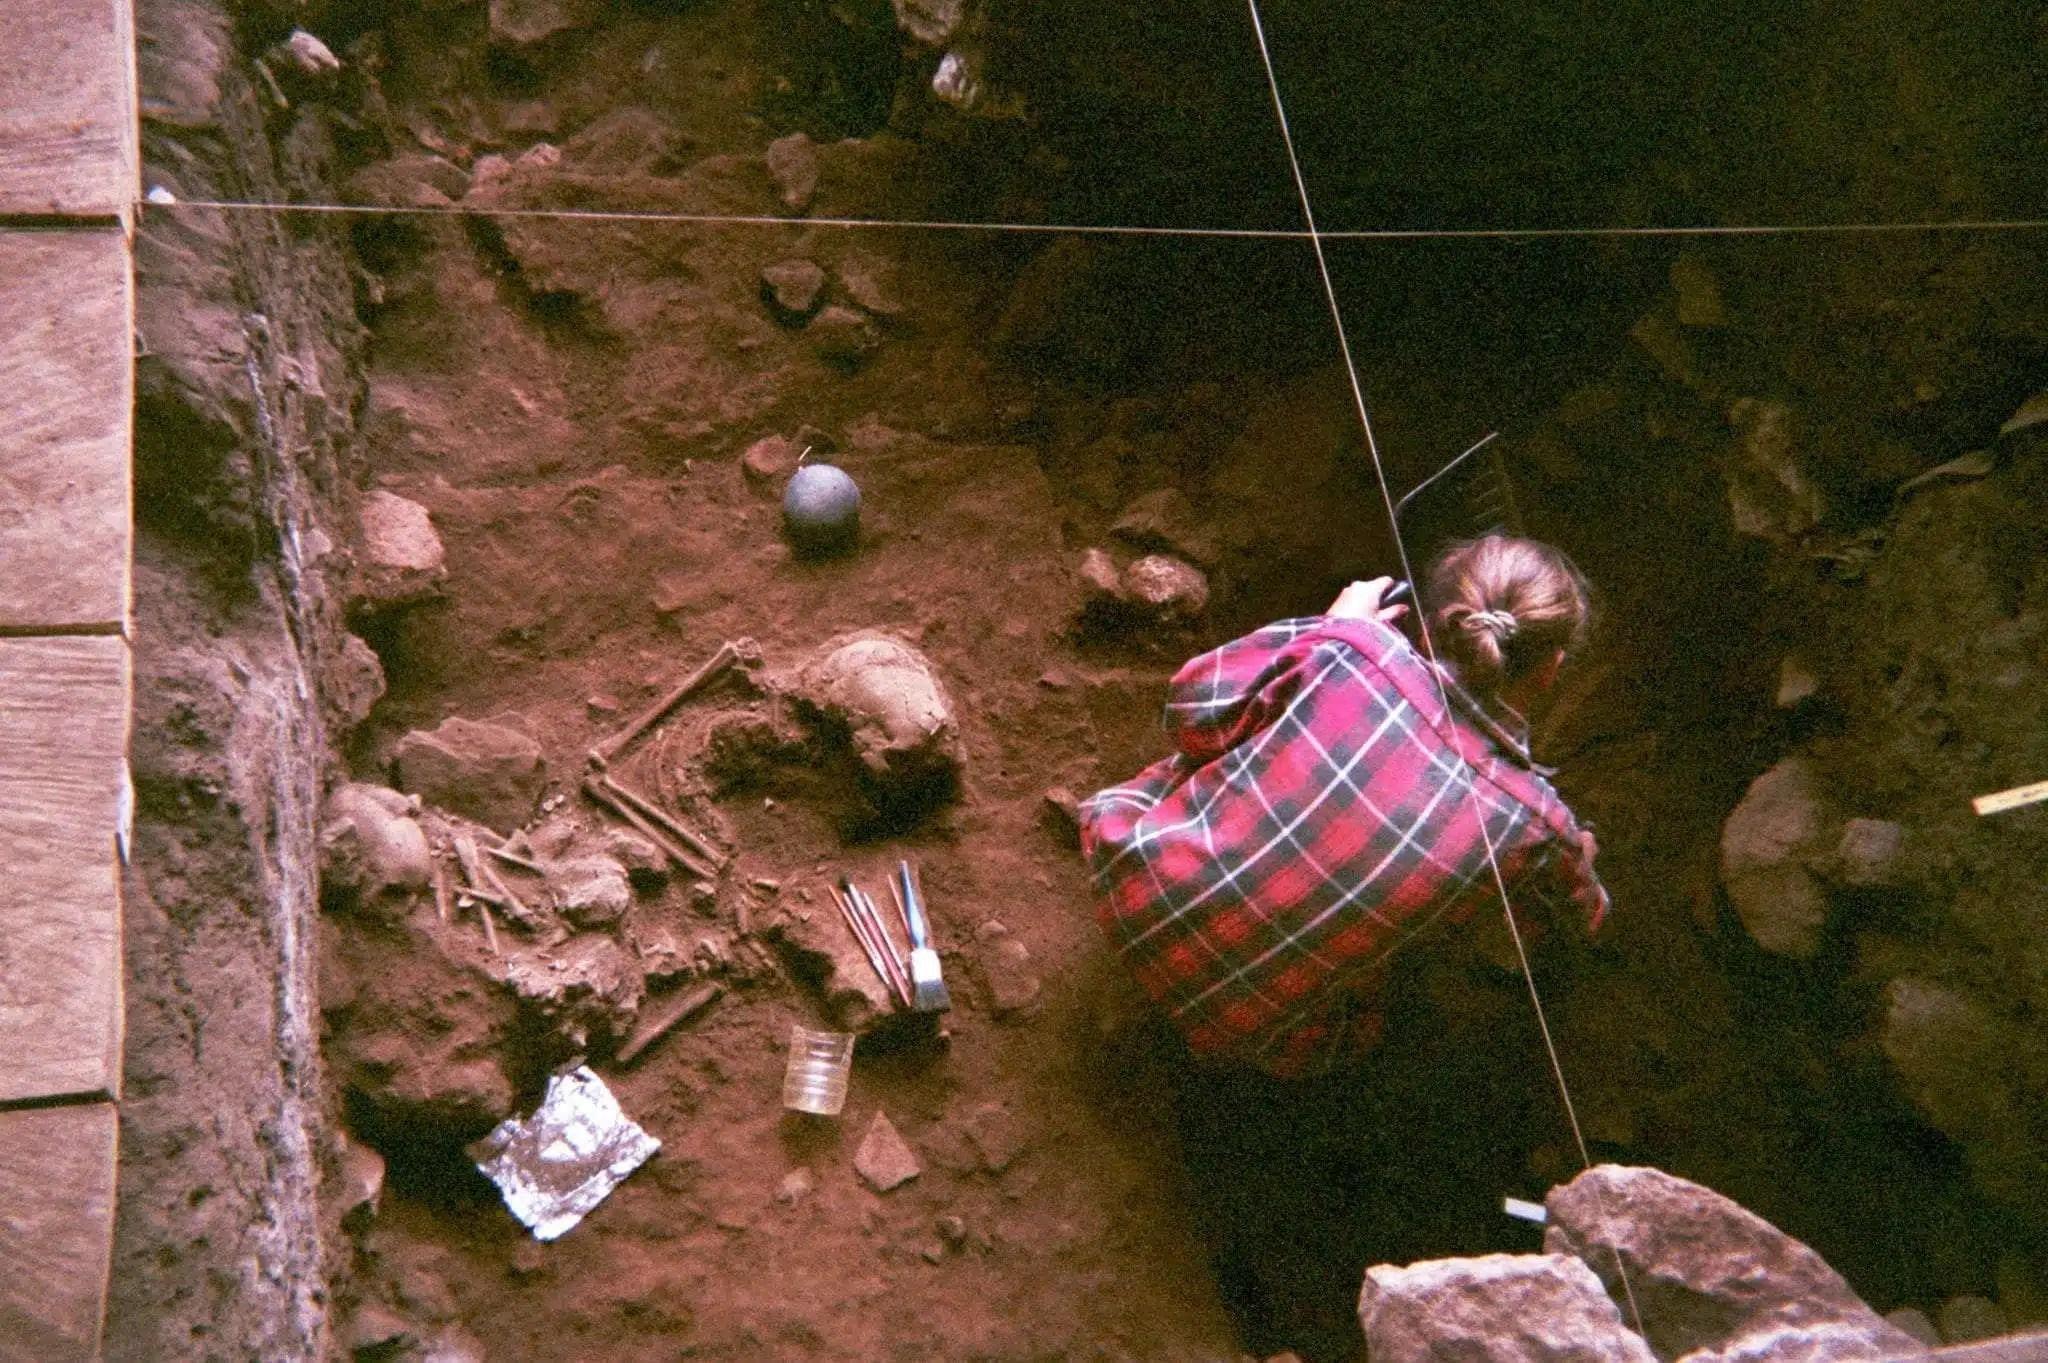 The Shum Laka rock shelter in Cameroon